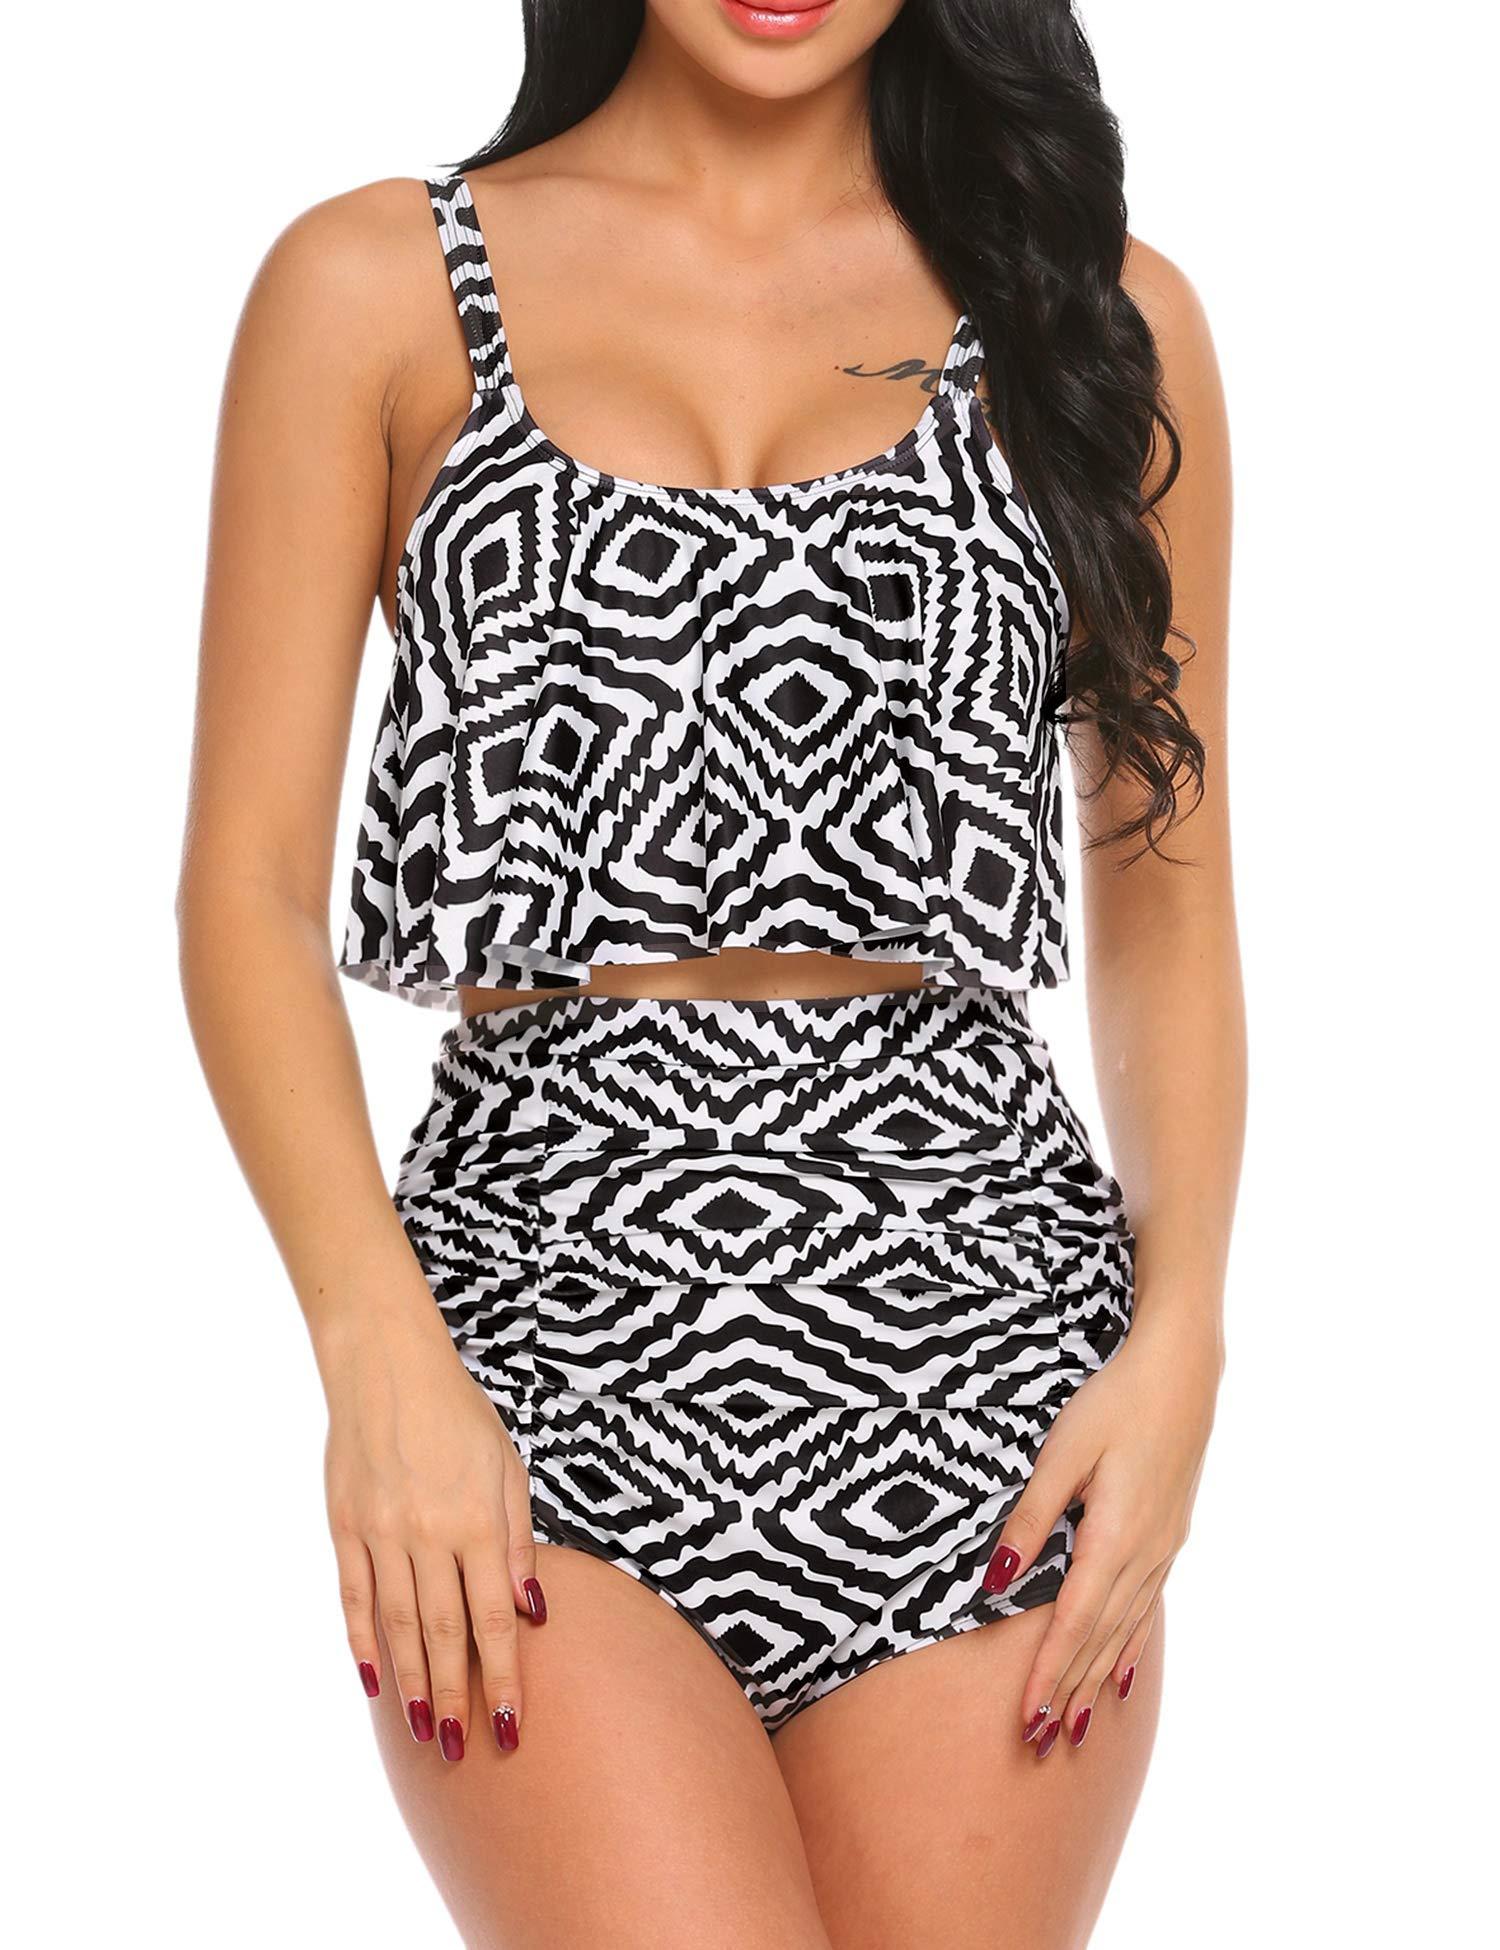 0e4e337055009 ADOME Tummy Control Swimsuits for Women Ruffled High Waisted Bikini Set  Floral Printed Plus Size Swimwear